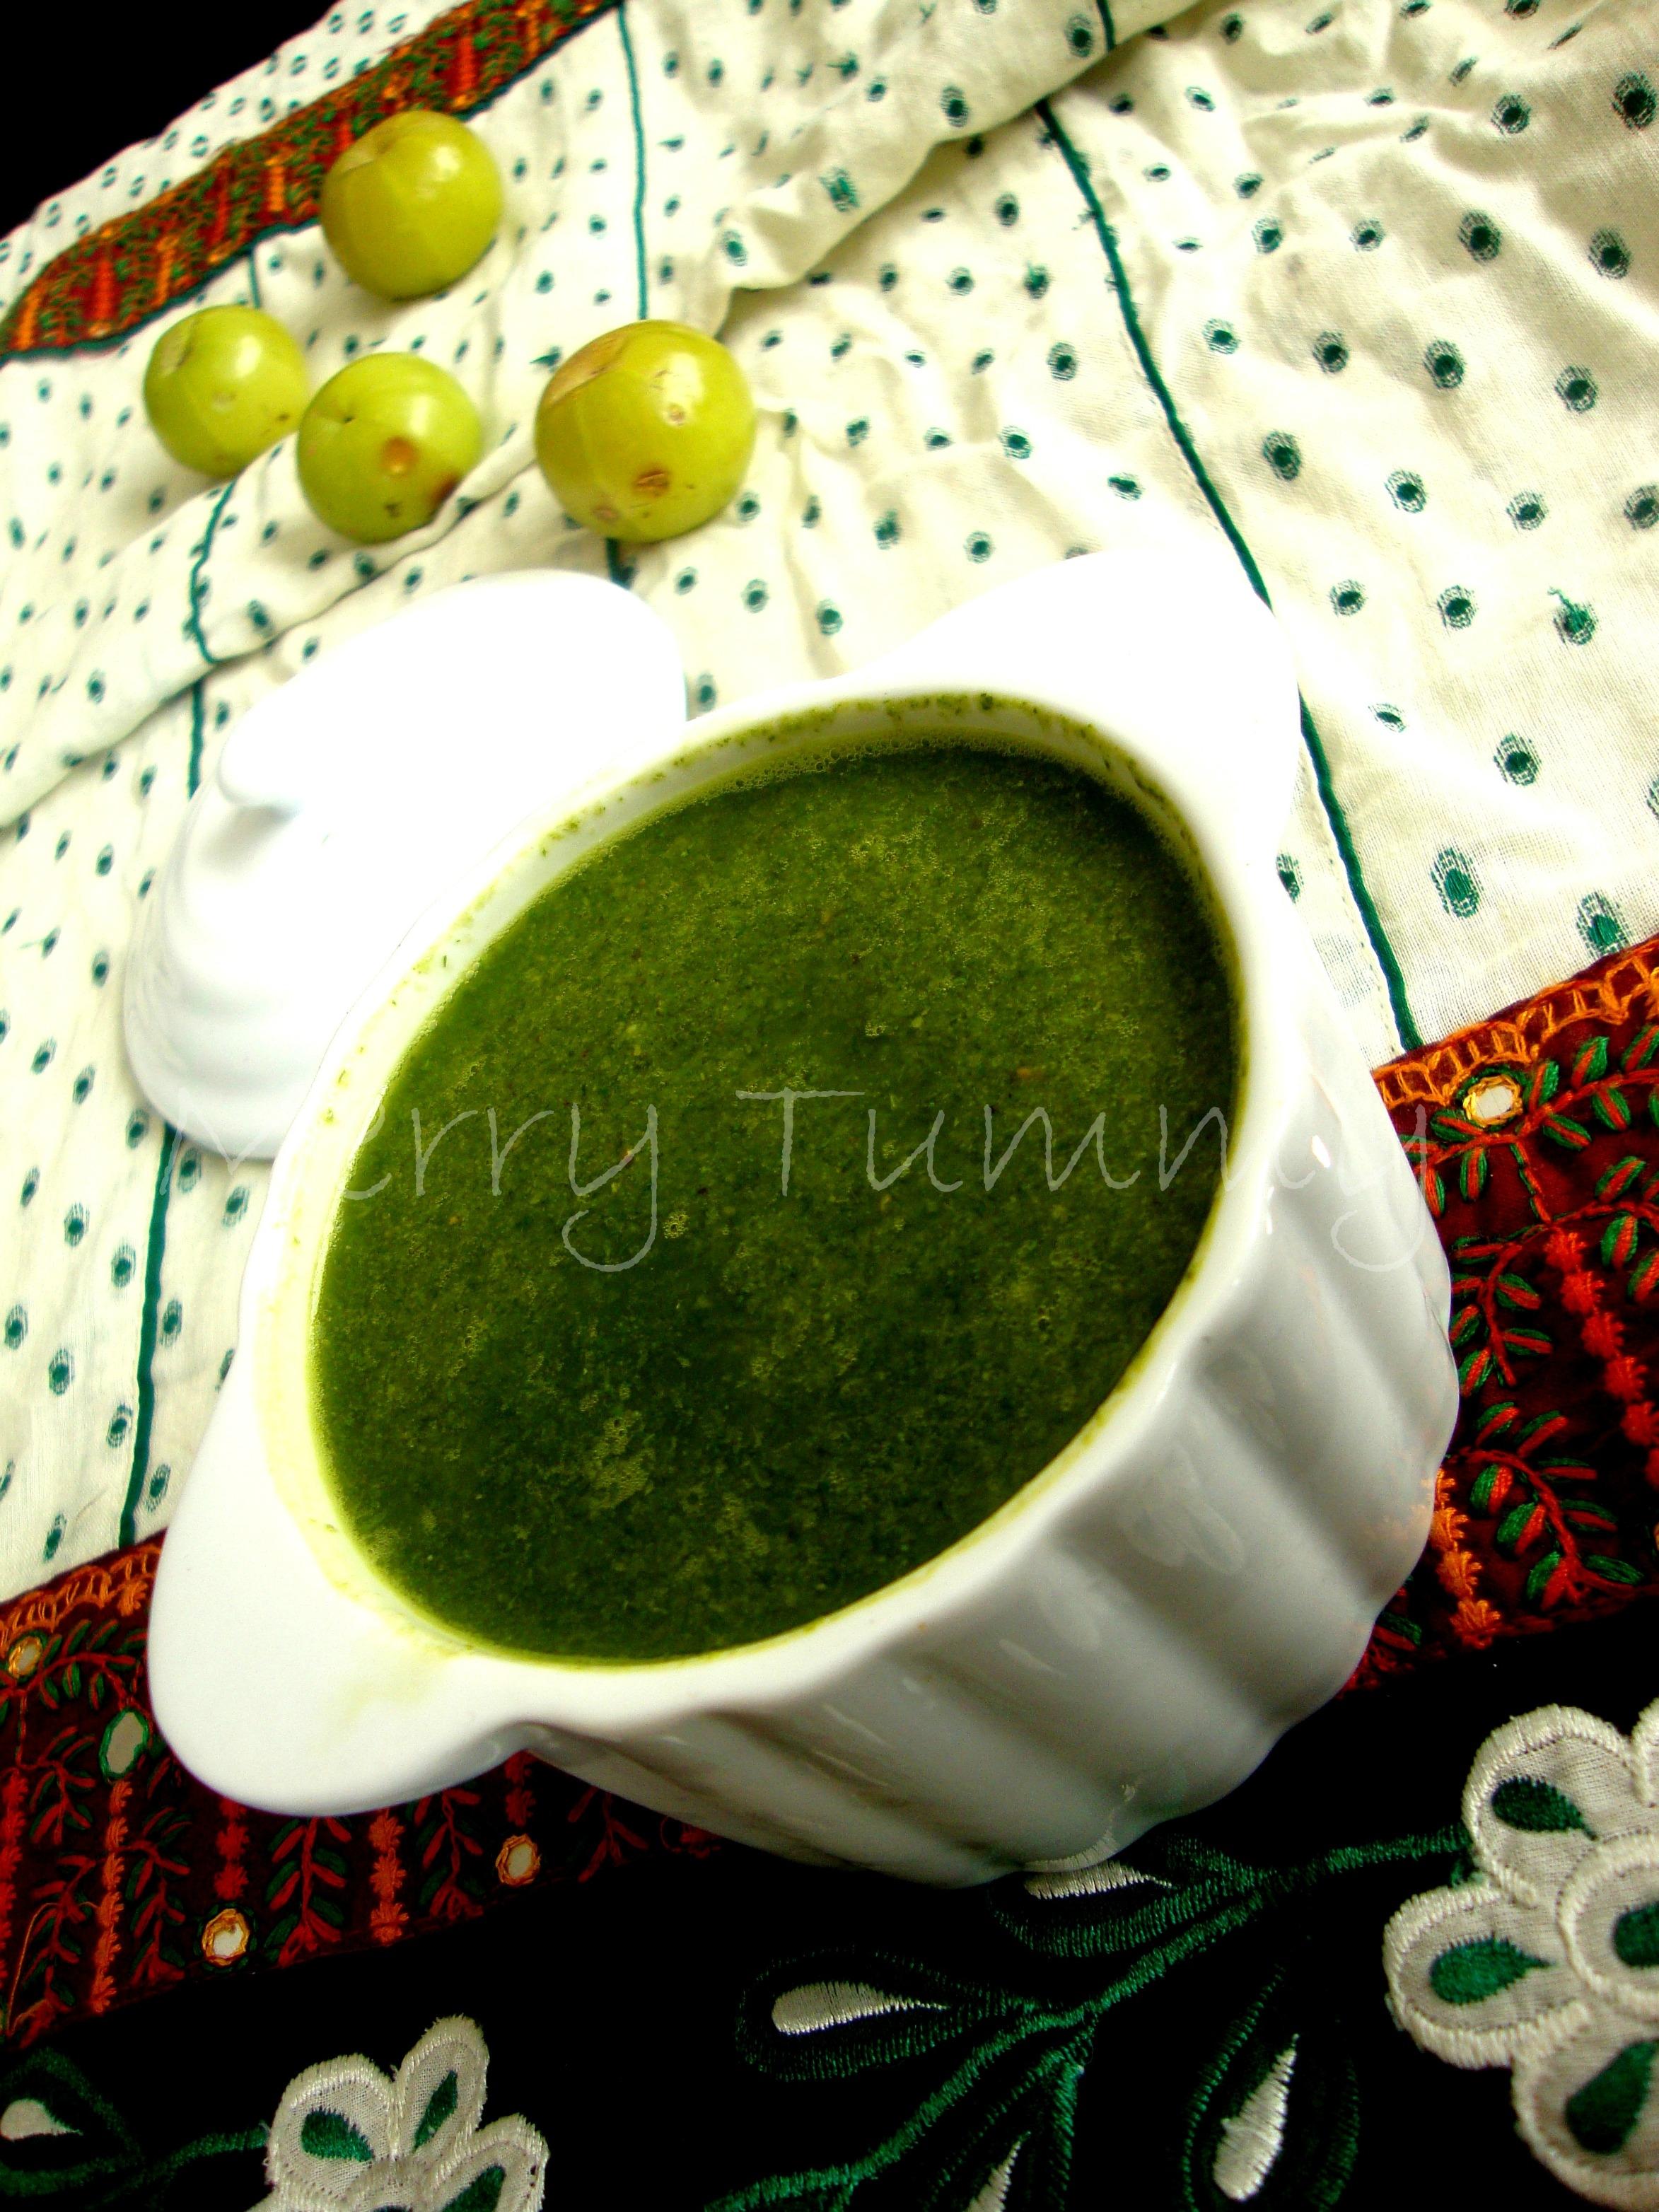 Indian Cooking: Chutney Recipe